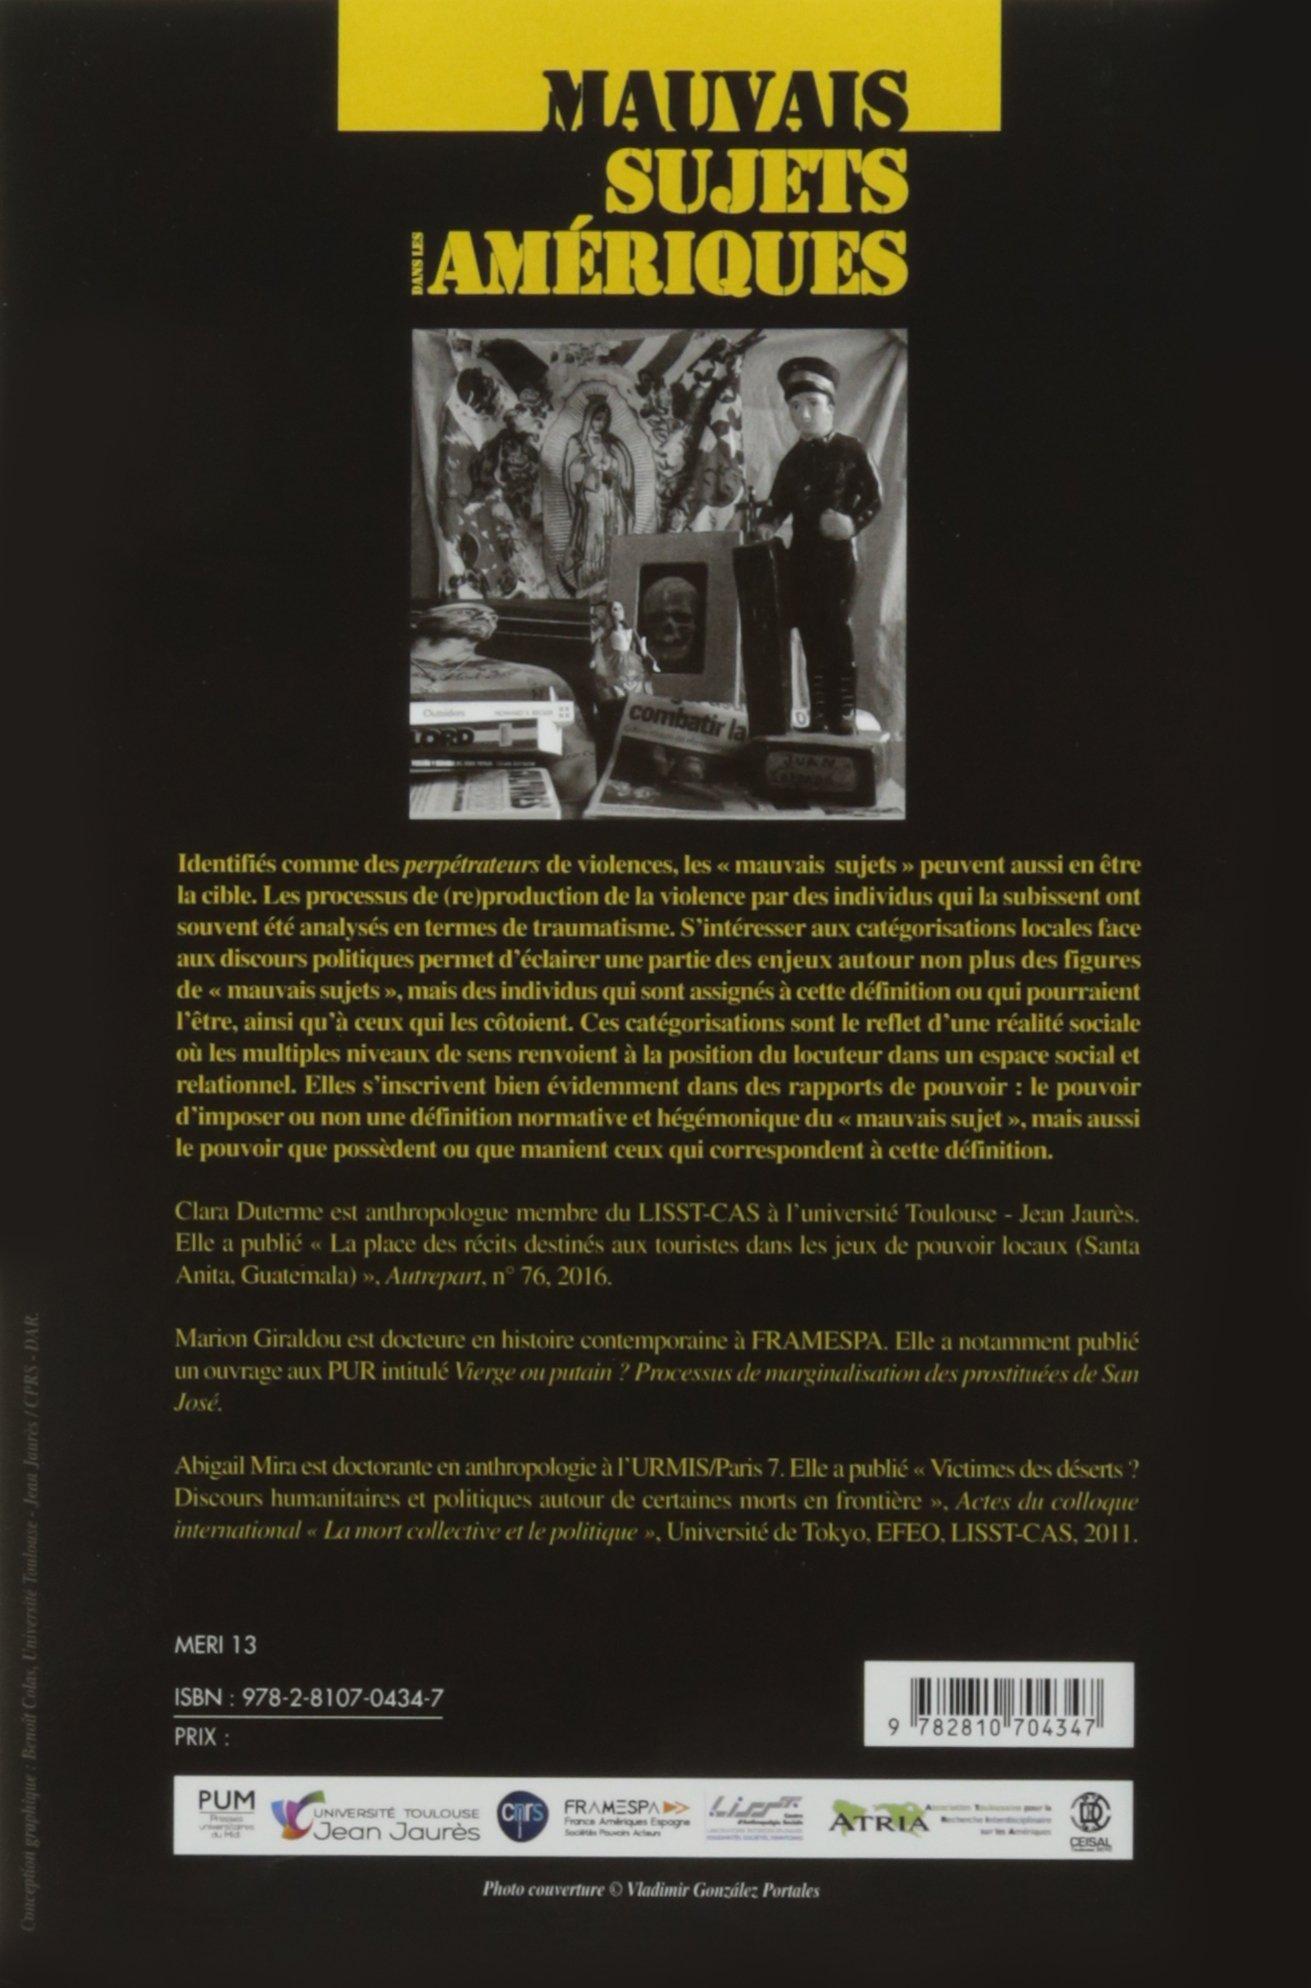 Mauvais sujets dans les ameriques (Méridiennes): Amazon.es: Collectif, Abigail Mira, Clara Duterme, Marion Giraldou, Richard Marin: Libros en idiomas ...